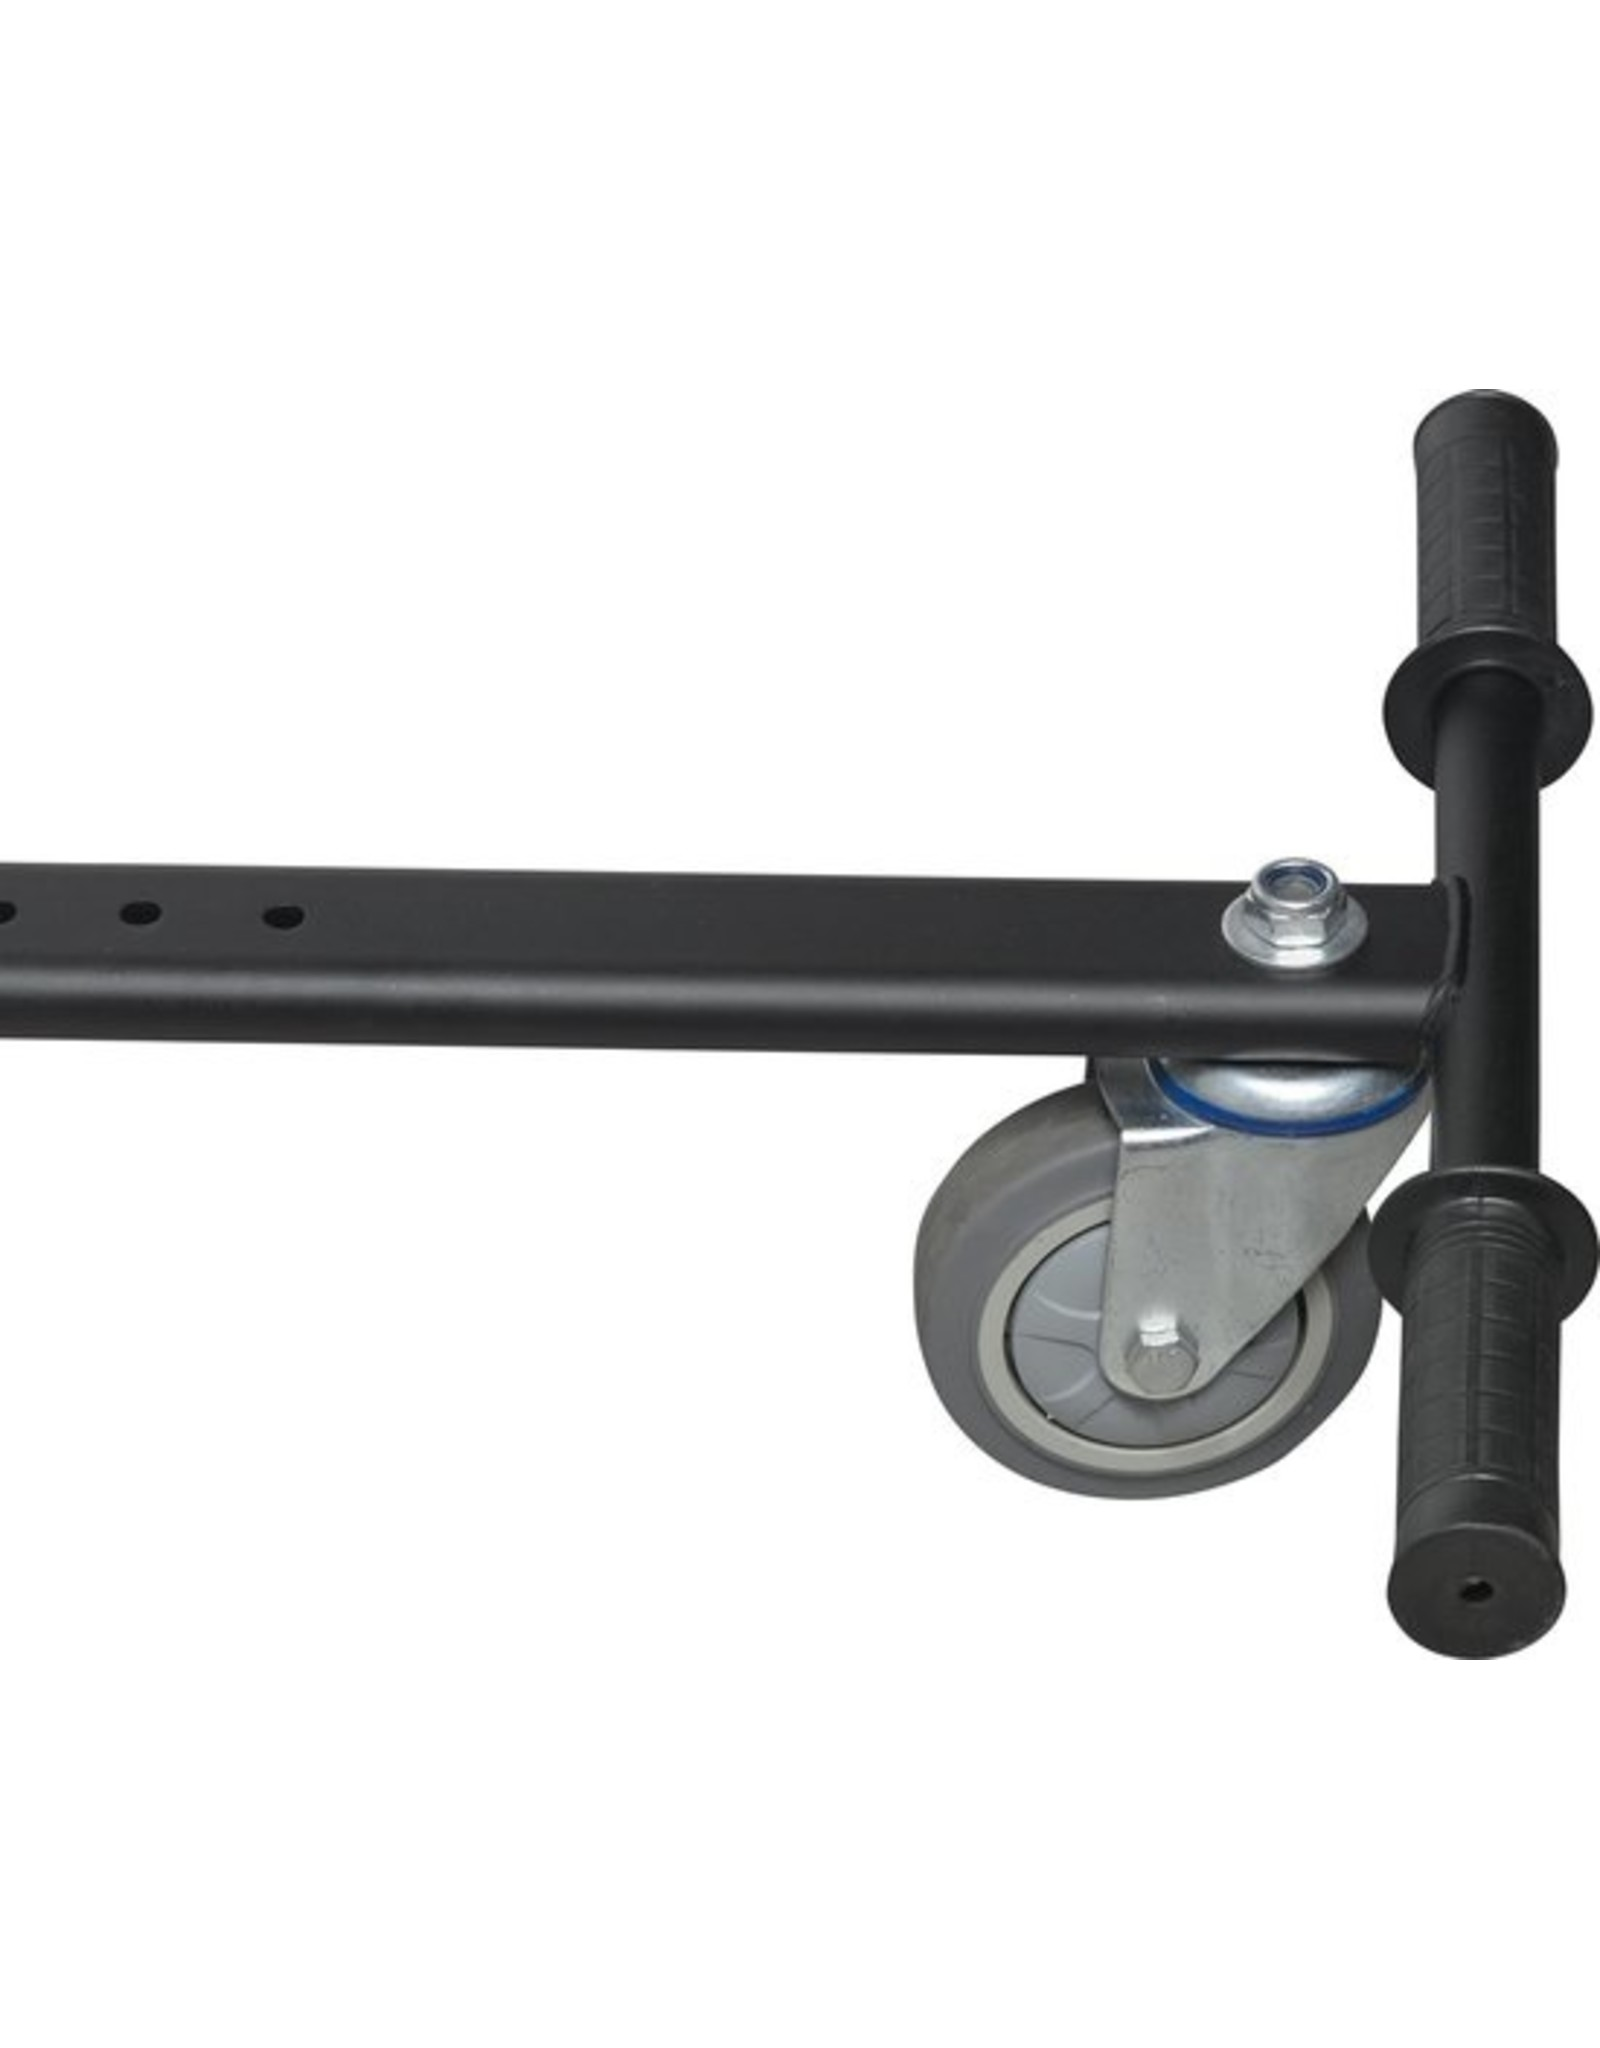 Denver HBO-6620 Black plus KAR-1550 - 6.5 inch hoverboard oxboard met hoverkart - Zwart